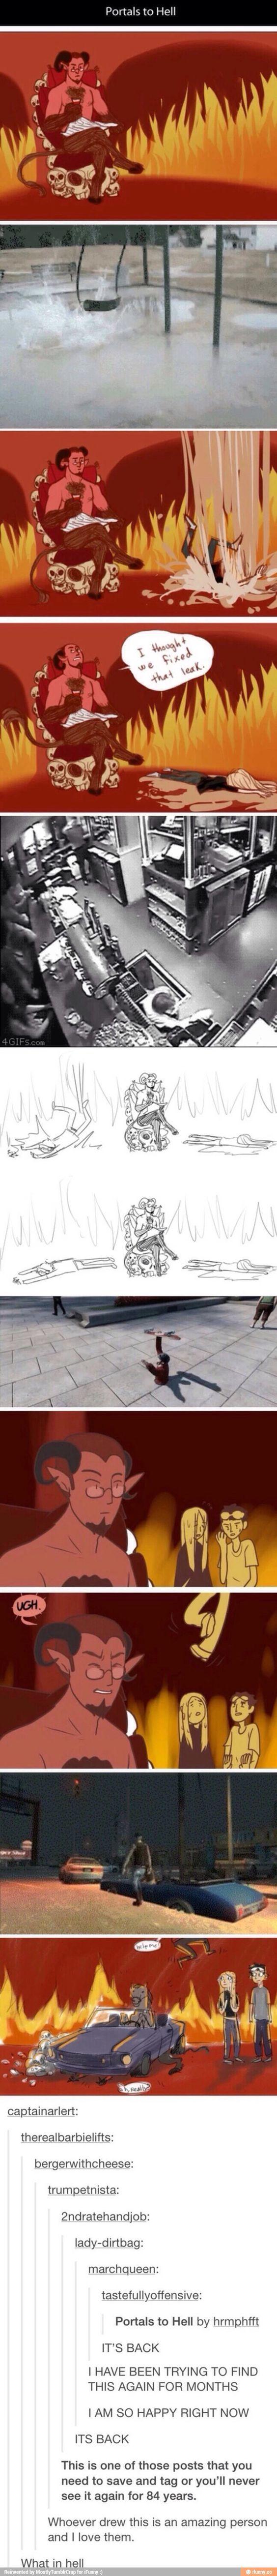 Tumblr hell portal drawings: